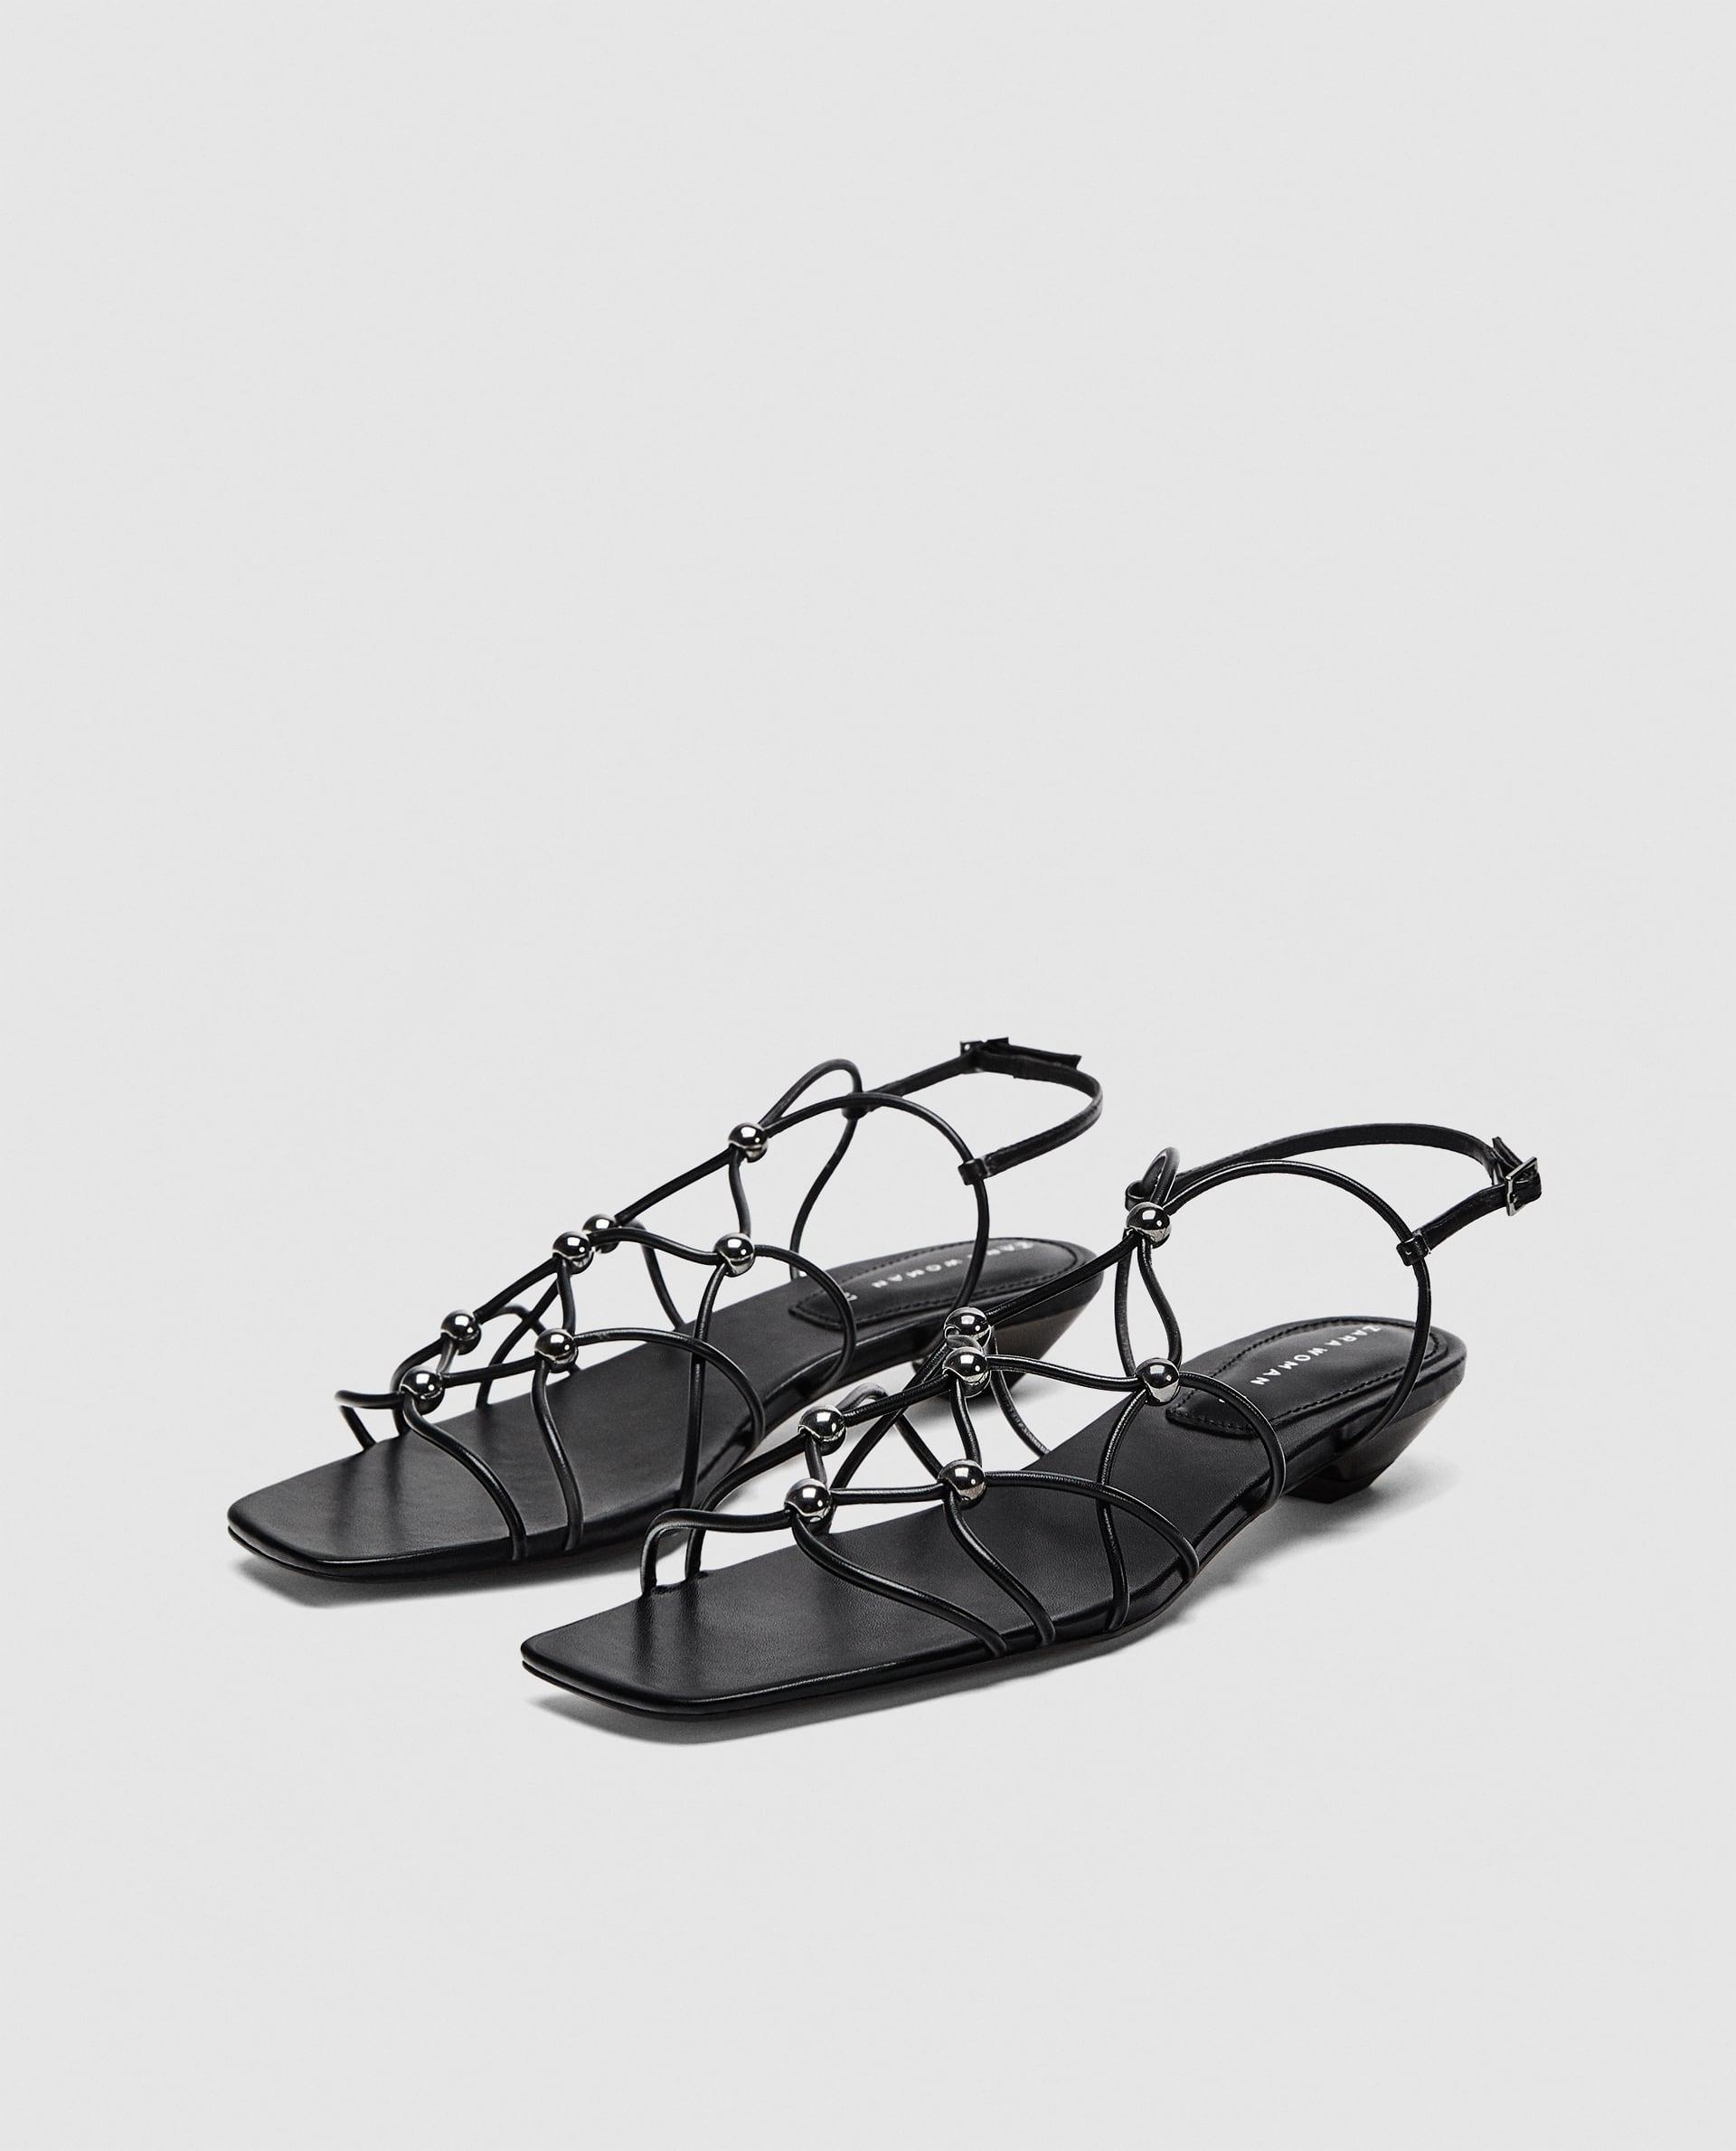 Zara + Strappy Sandals with Metal Details